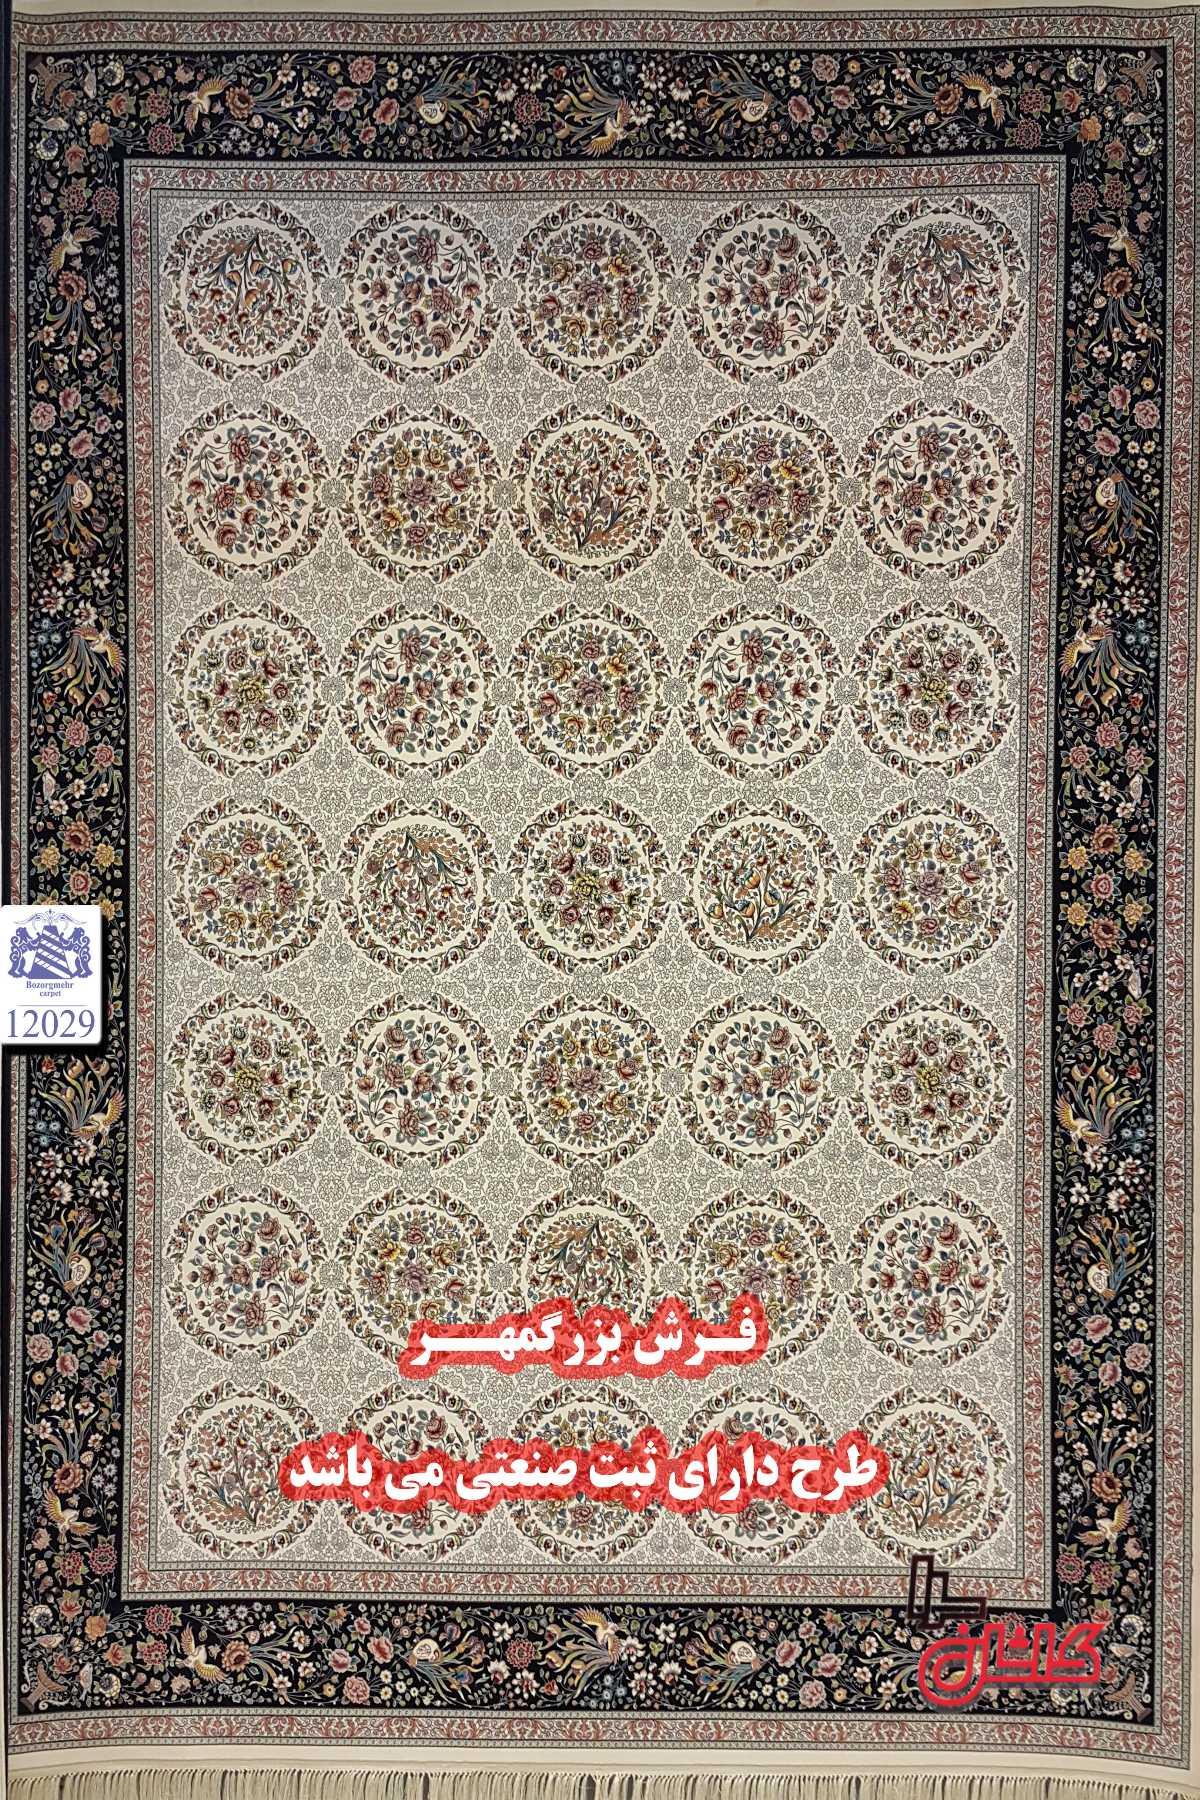 قیمت فرش ماشینی ۱۲۰۰ شانه کد ۱۲۰۲۹